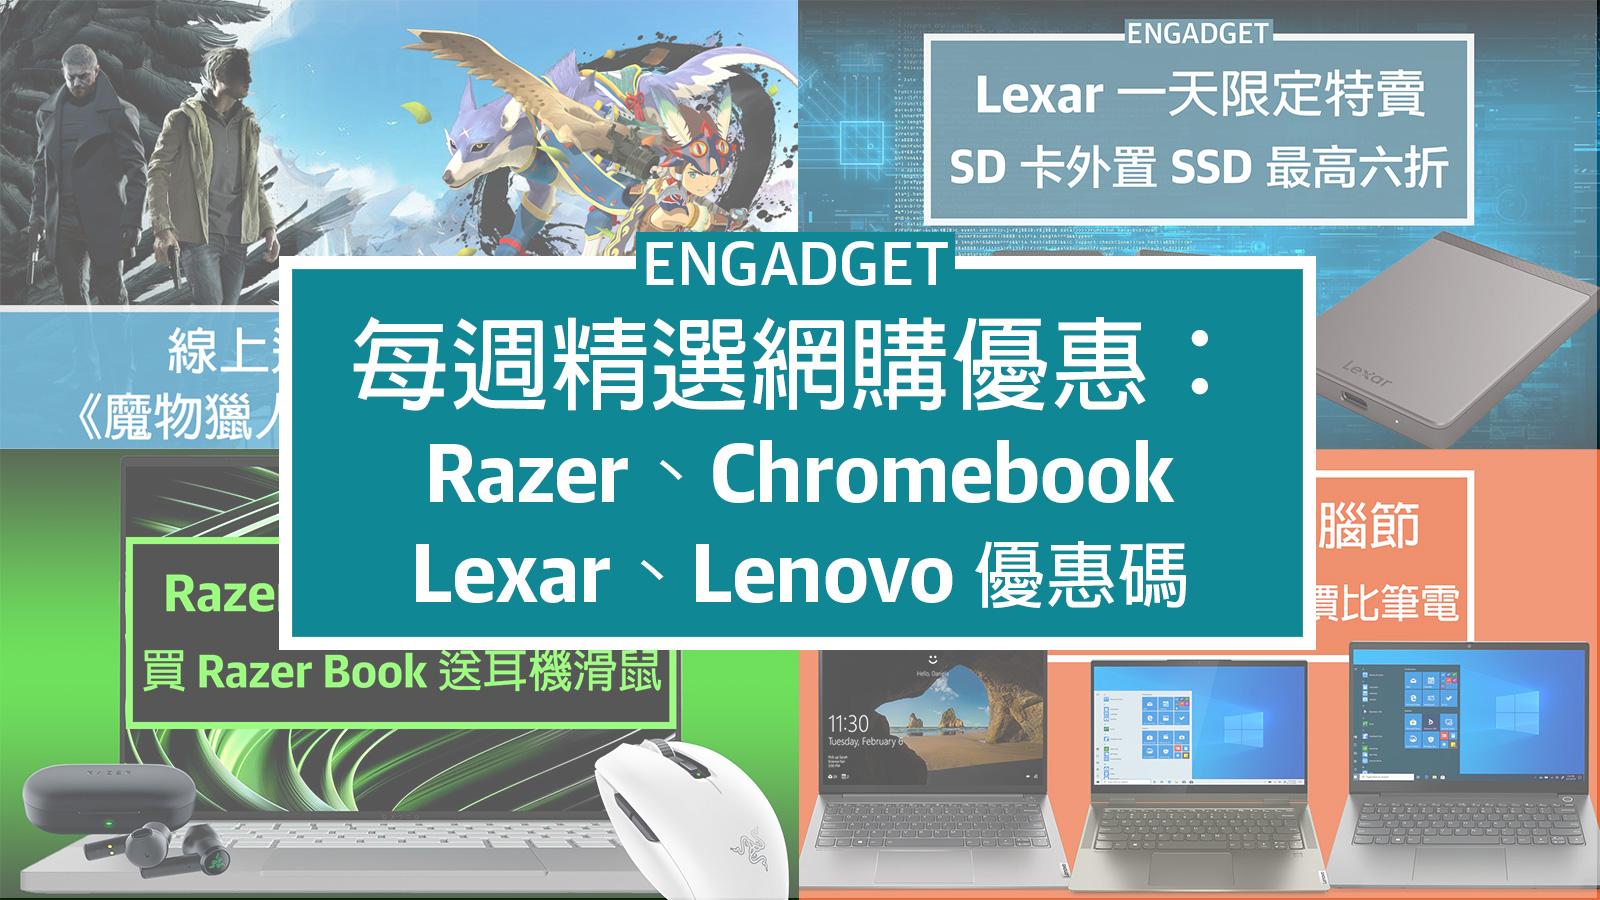 engadget-weekly-deals-20210823